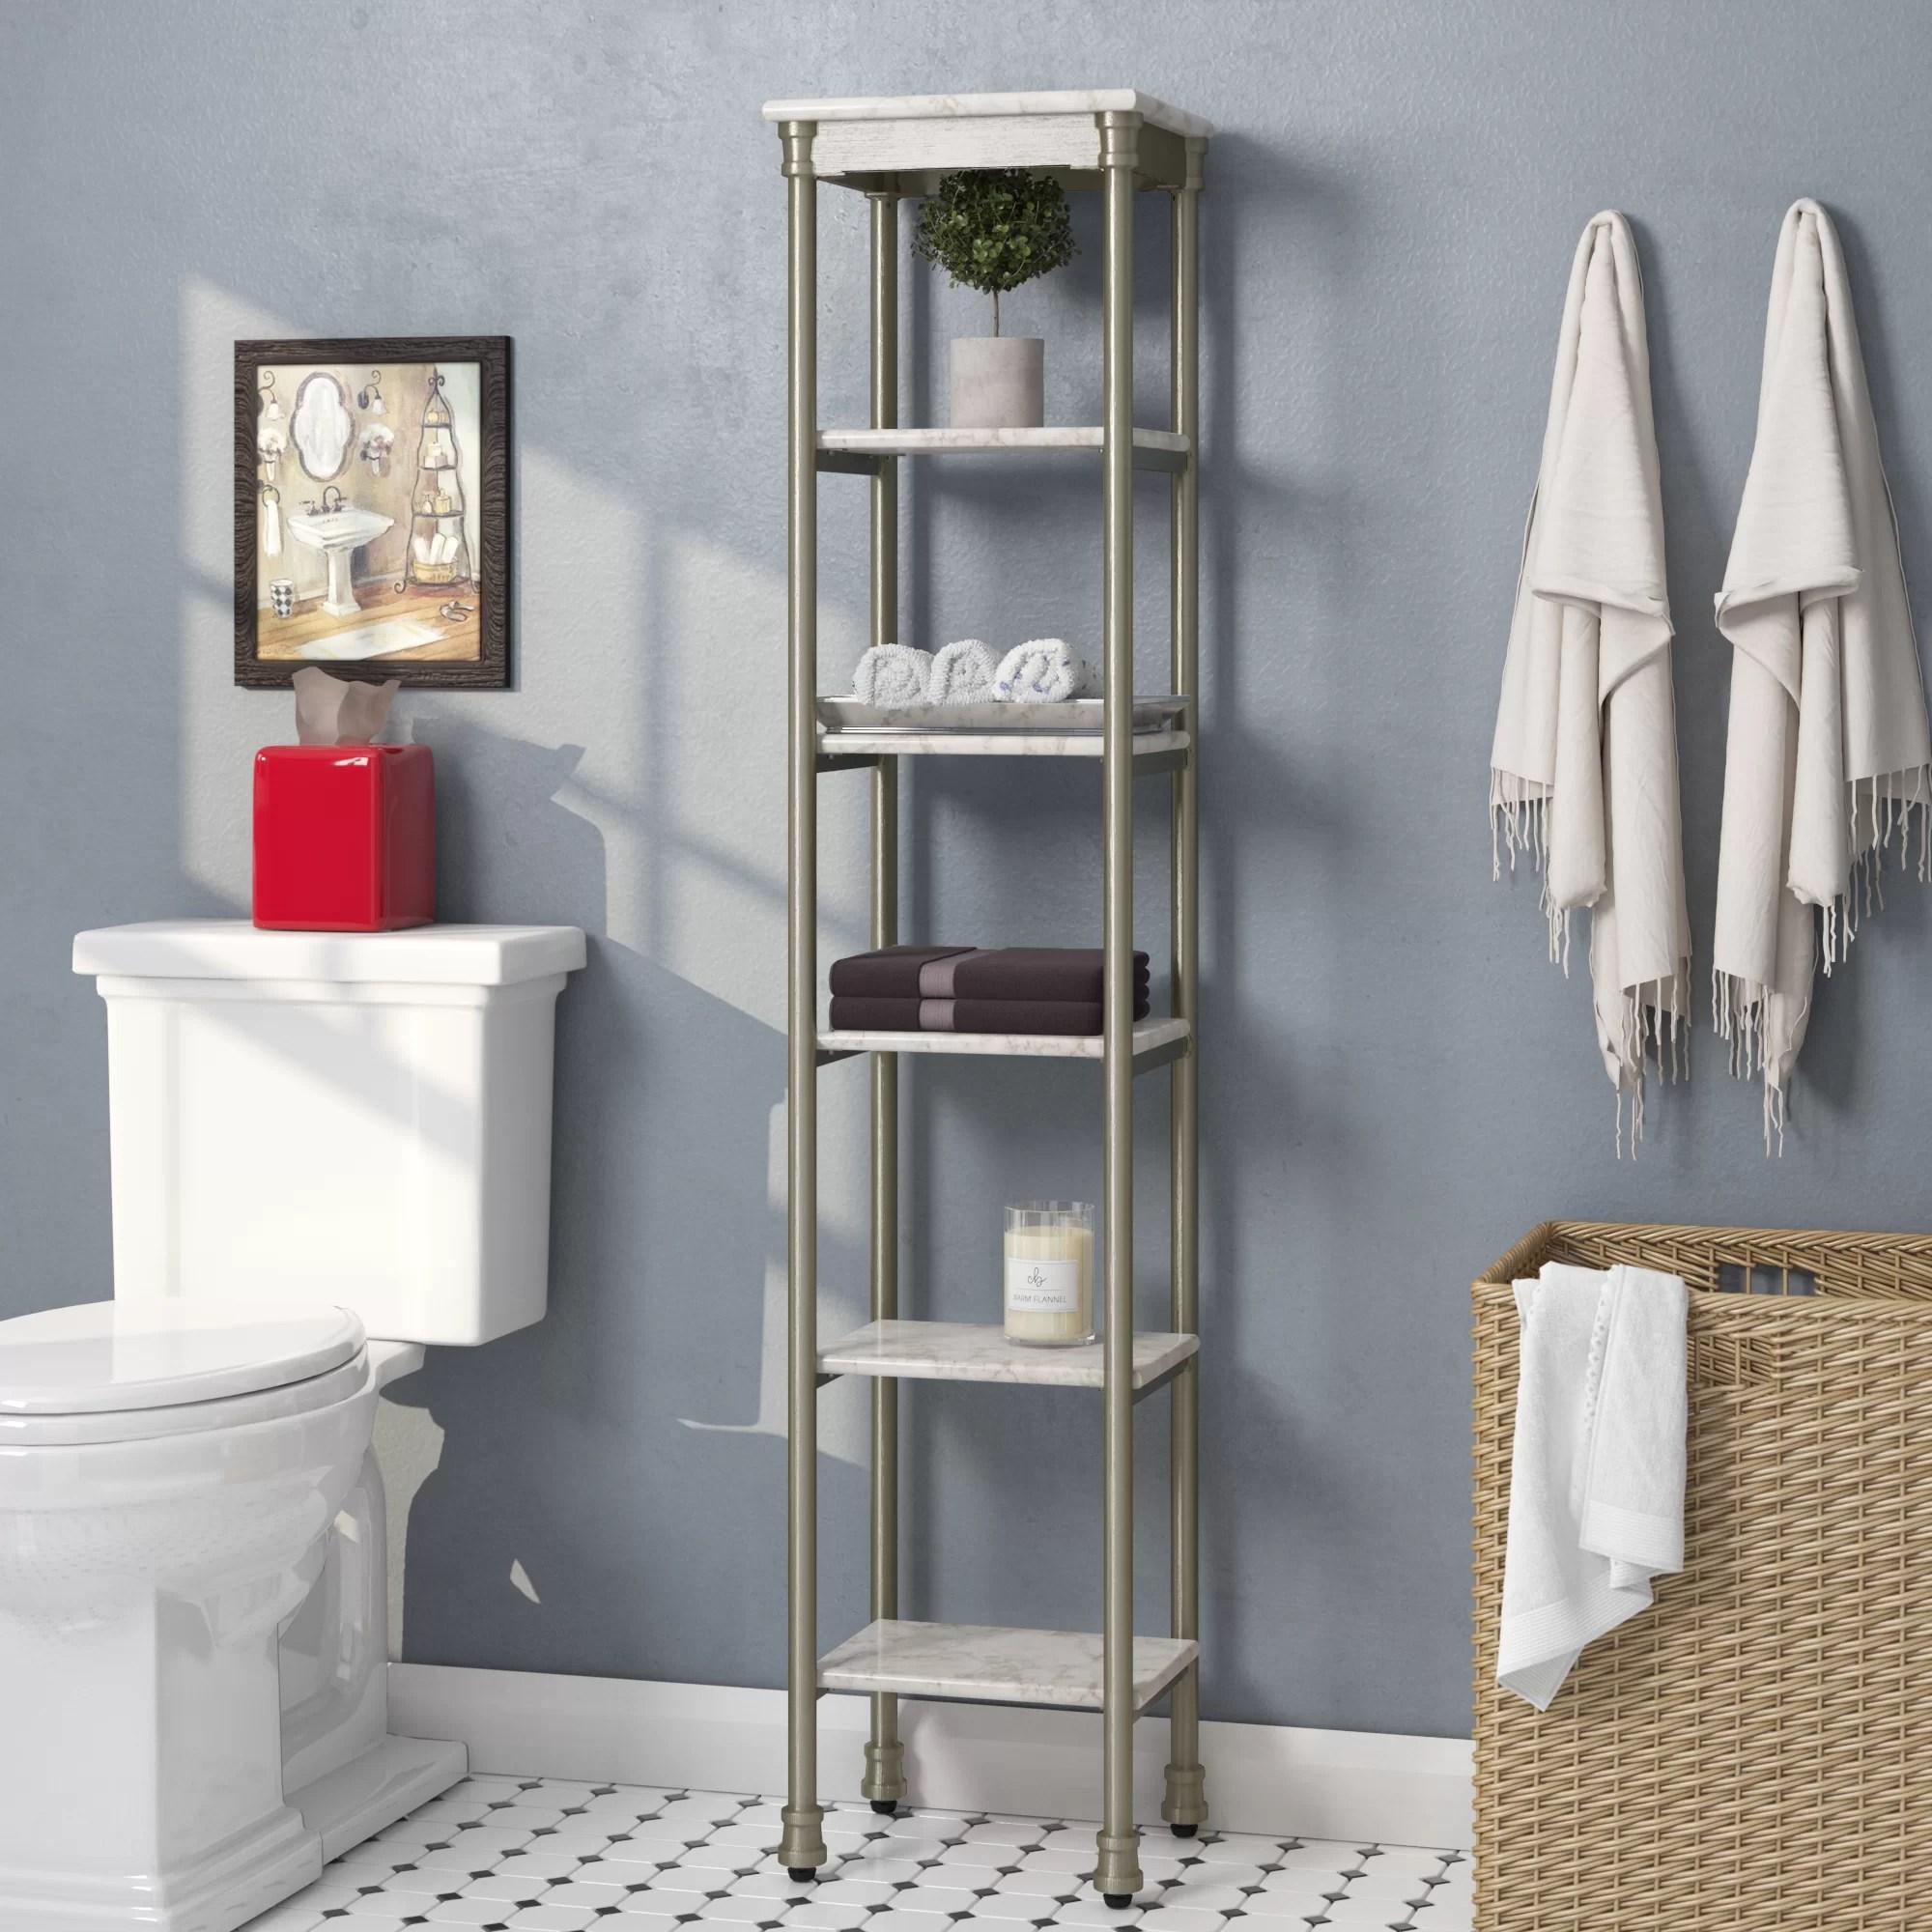 Beachcrest Home Nauman 13 W X 60 H Bathroom Shelf Reviews Wayfair